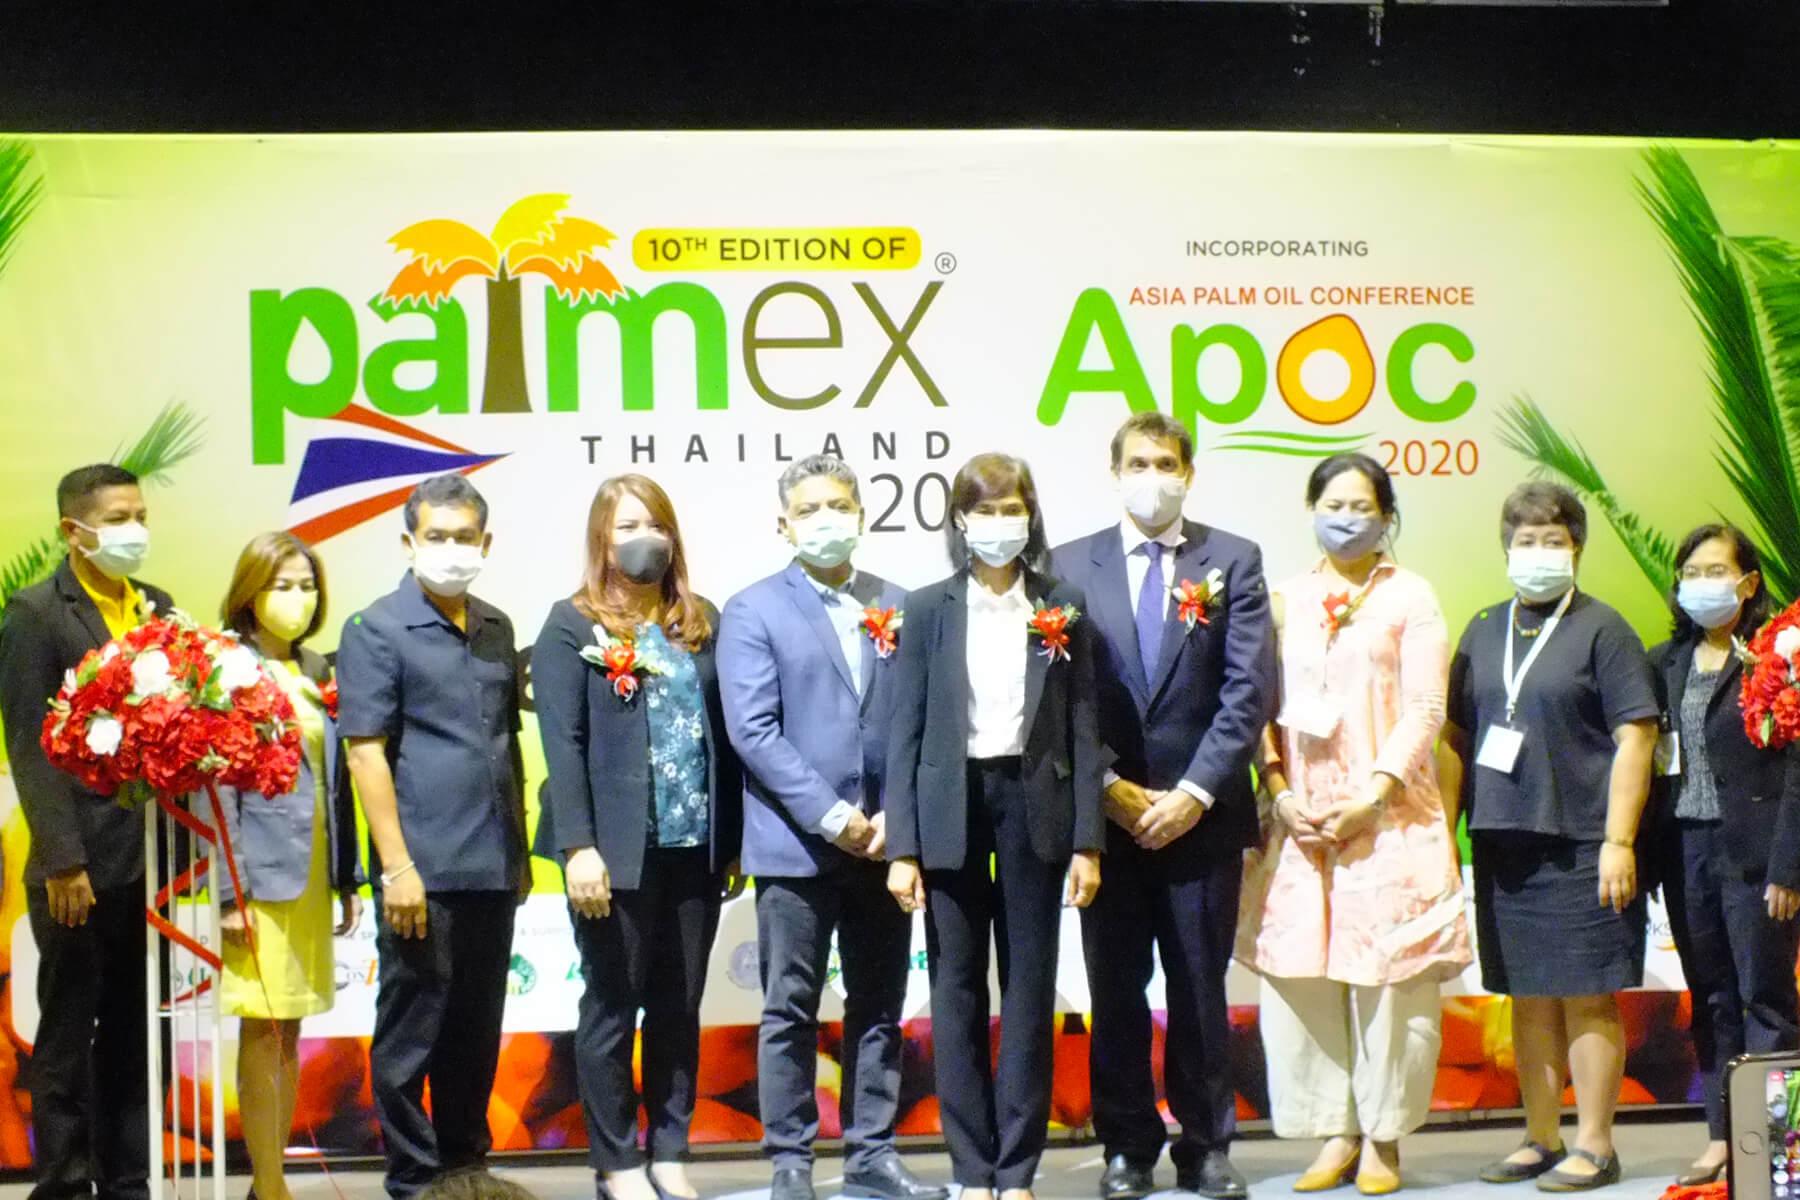 Palmex Thailand 2020 ICC HATYAI ศูนย์ประชุมนานาชาติฉลองสิริราชสมบัติครบ ๖๐ ปี